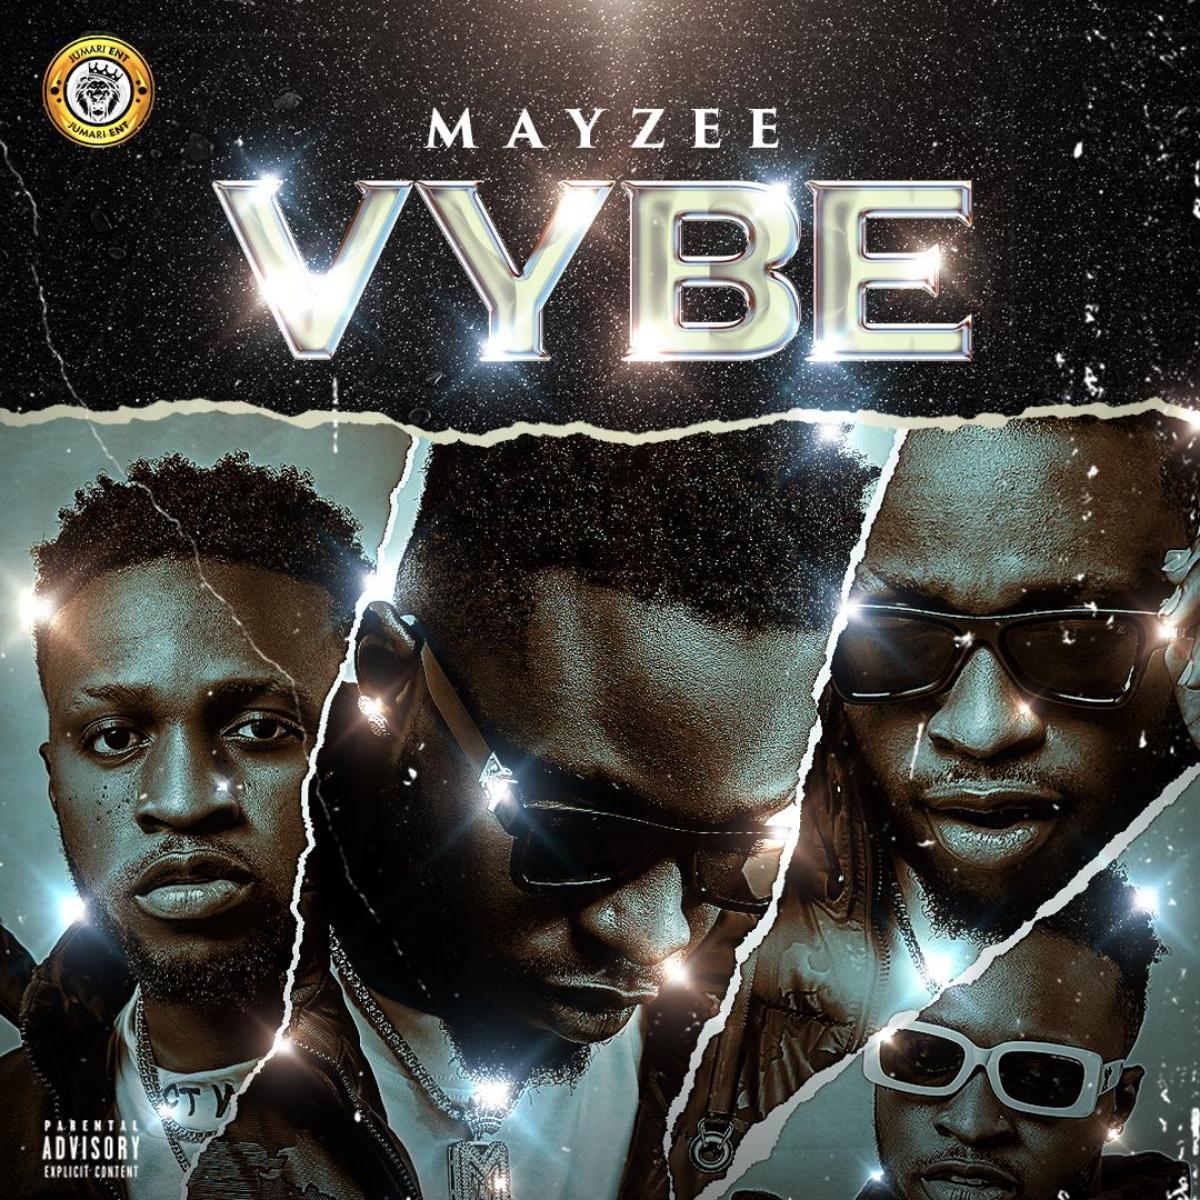 (MUSIC) Mayzee – Vybe